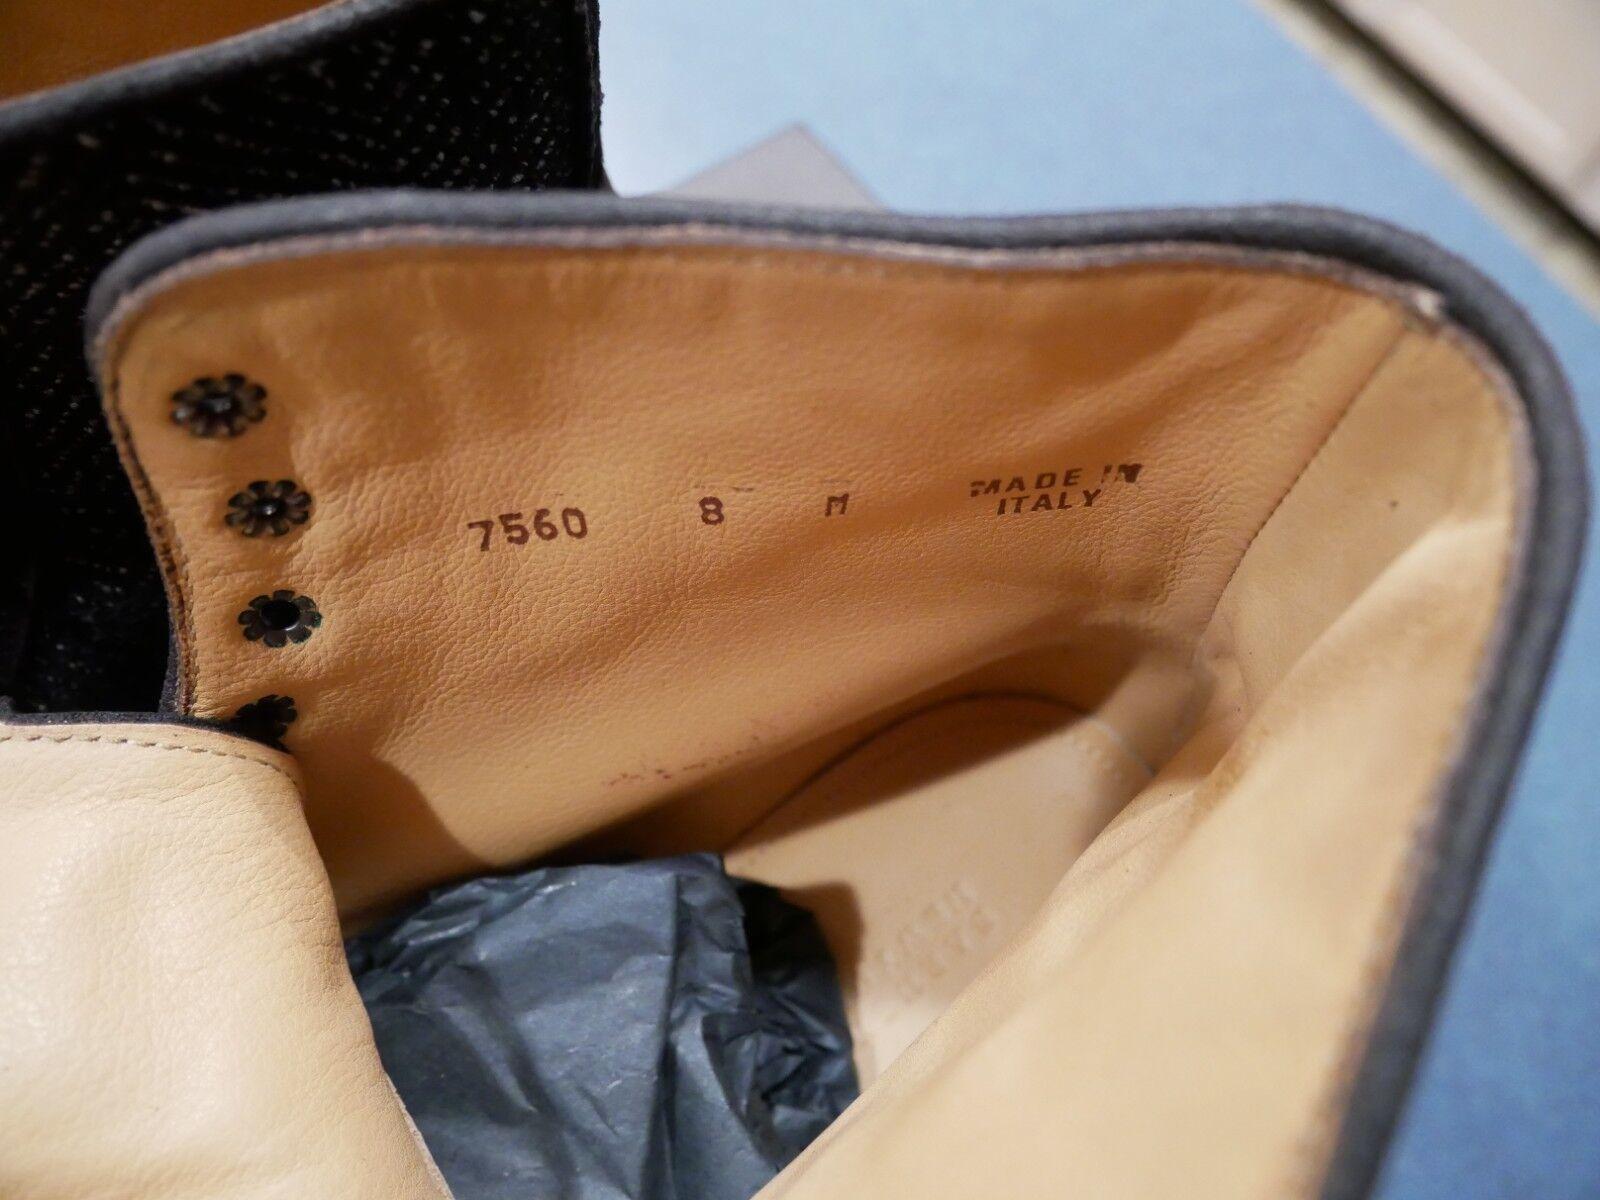 Barneys New York Stiefel    NIB Retail  495 Größe 8 7cbb36